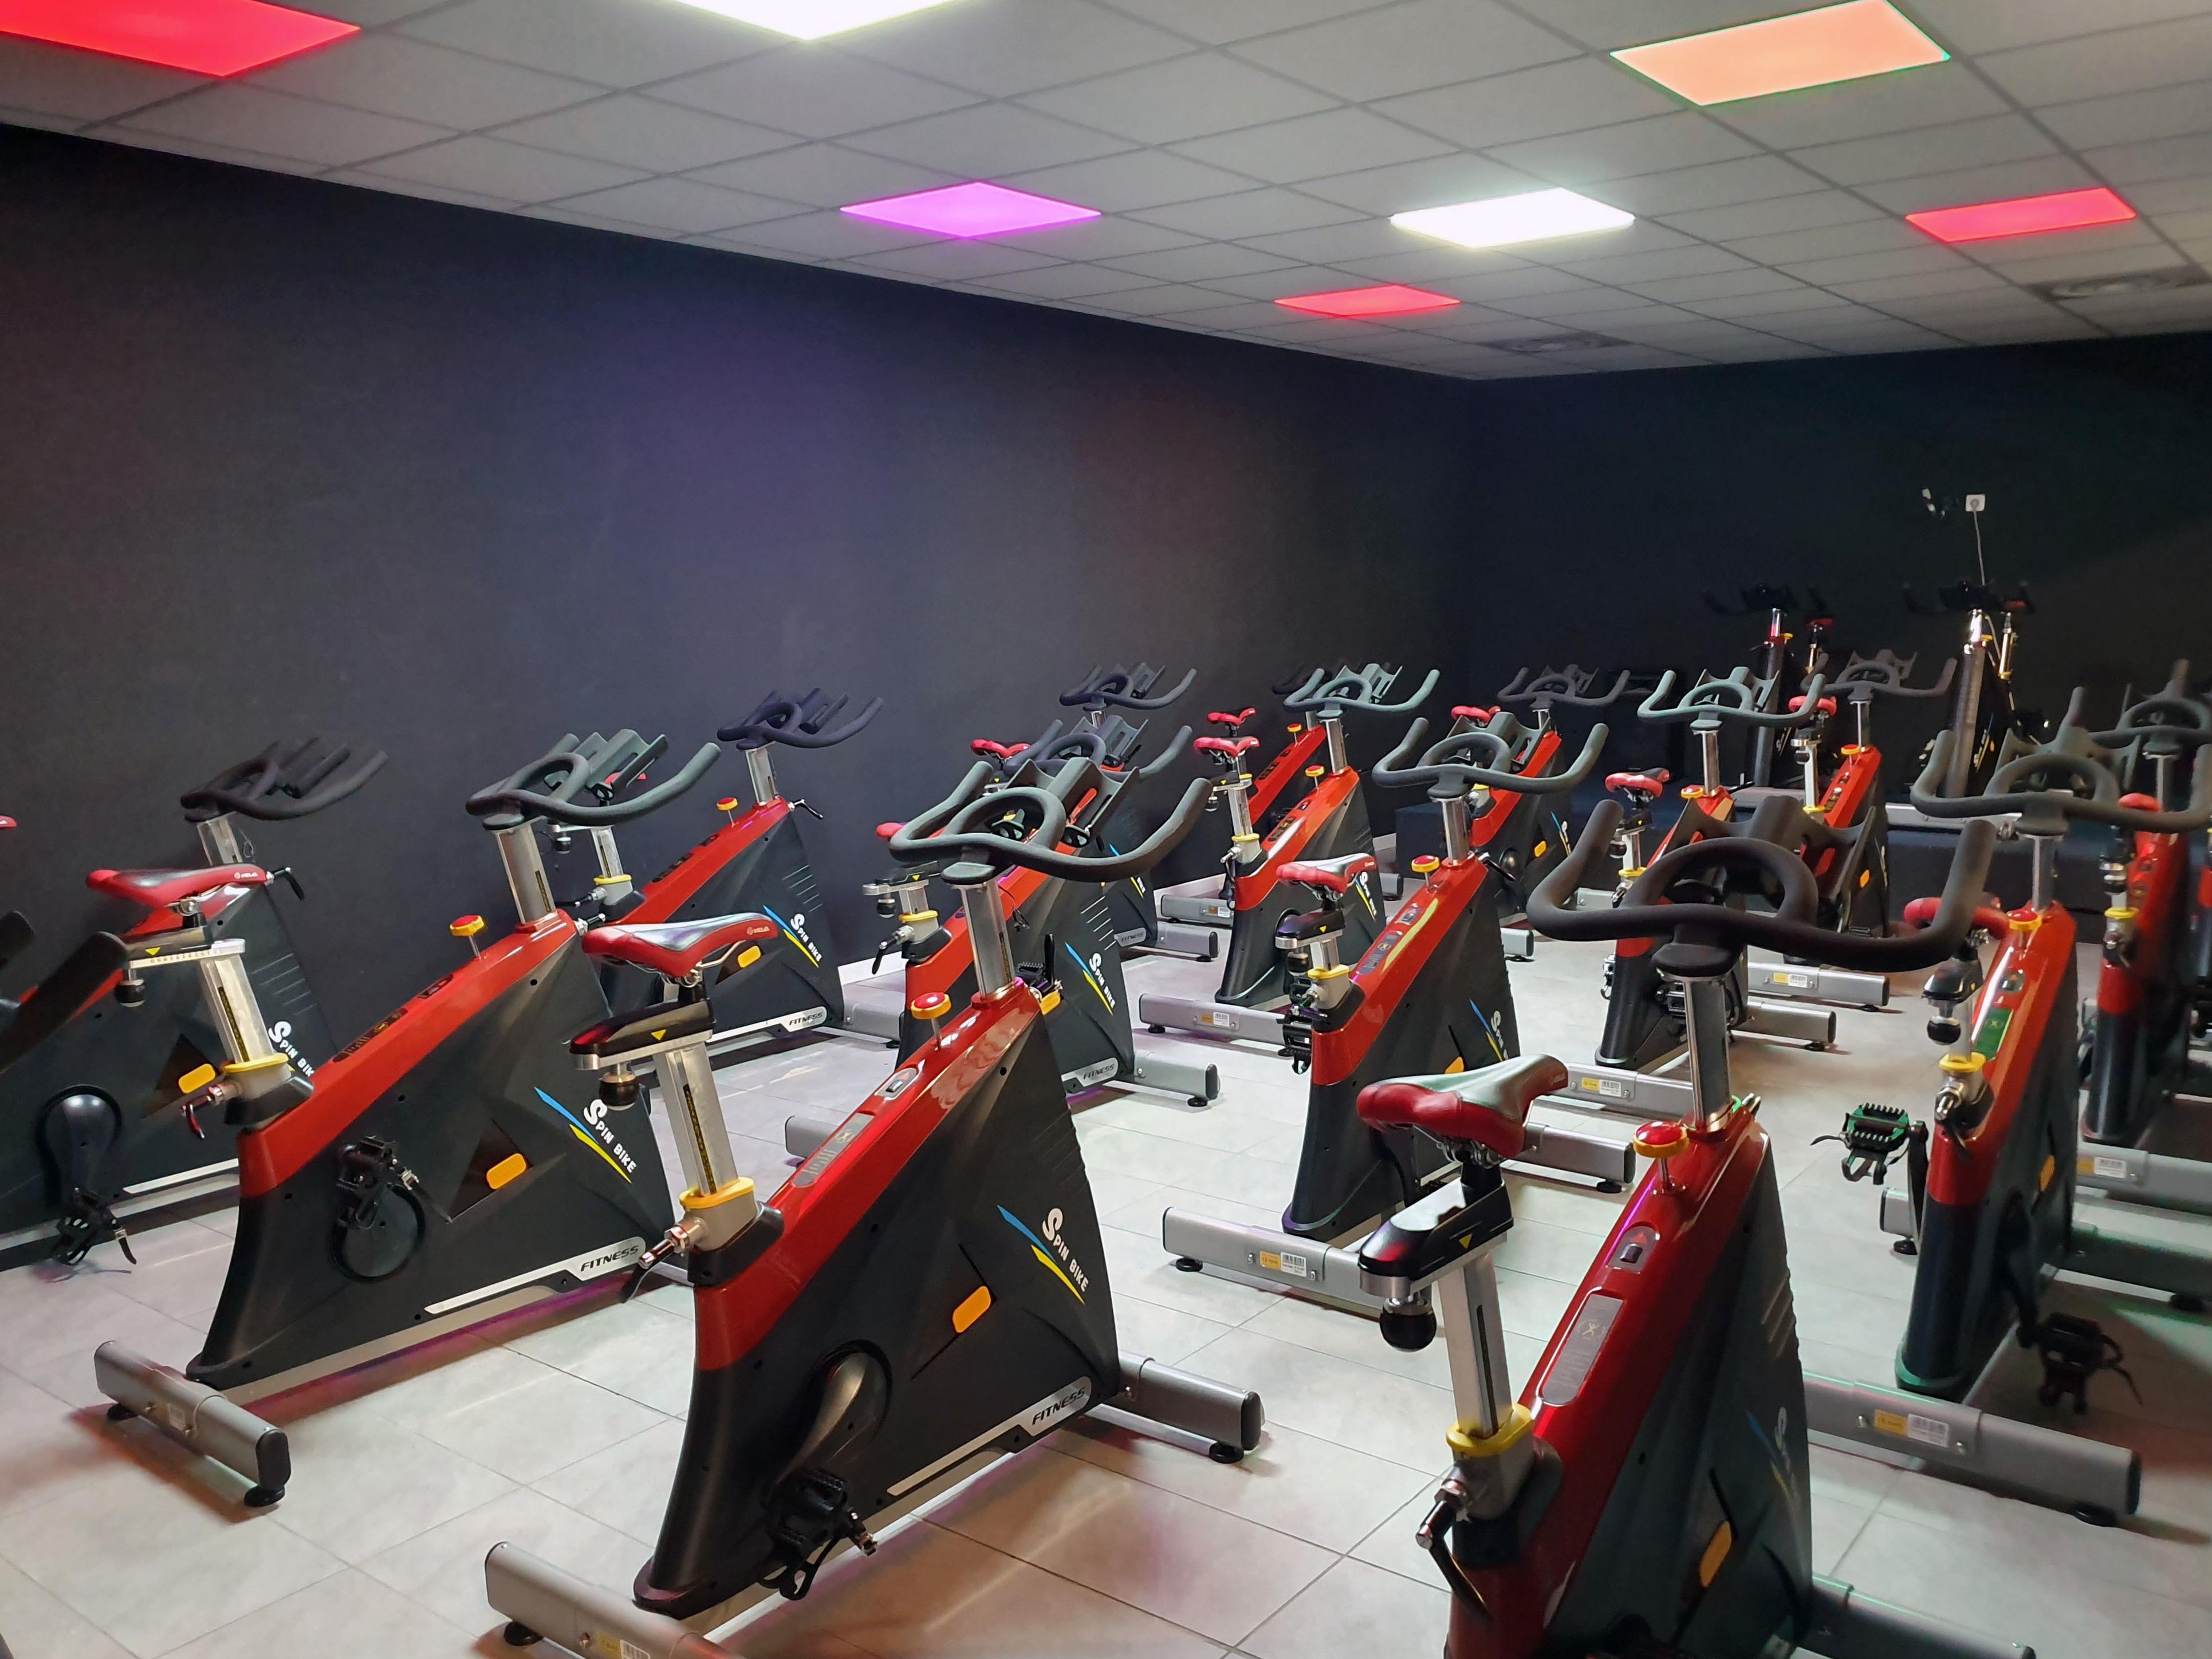 Simply Gym Toulouse Montaudran